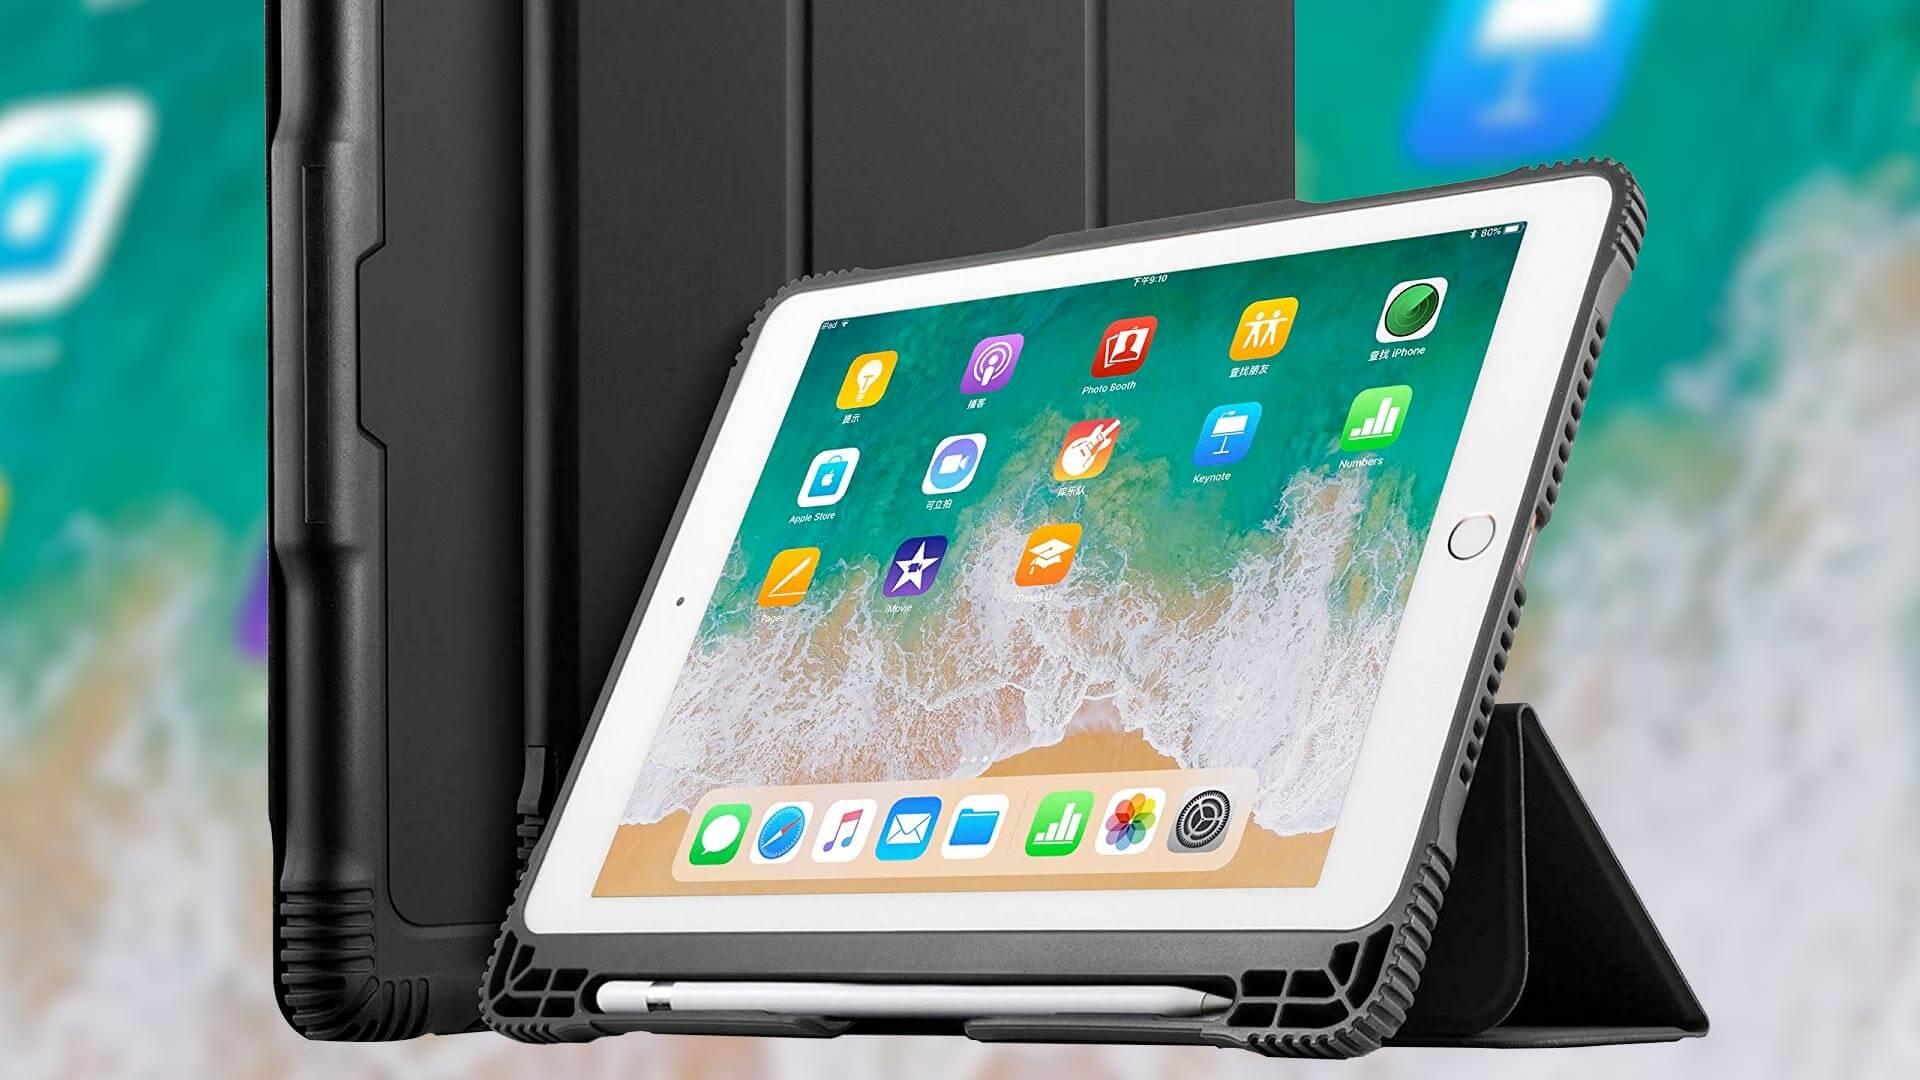 Best iPad Pro 9.7-inch Folio Cases in 2021 - iGeeksBlog